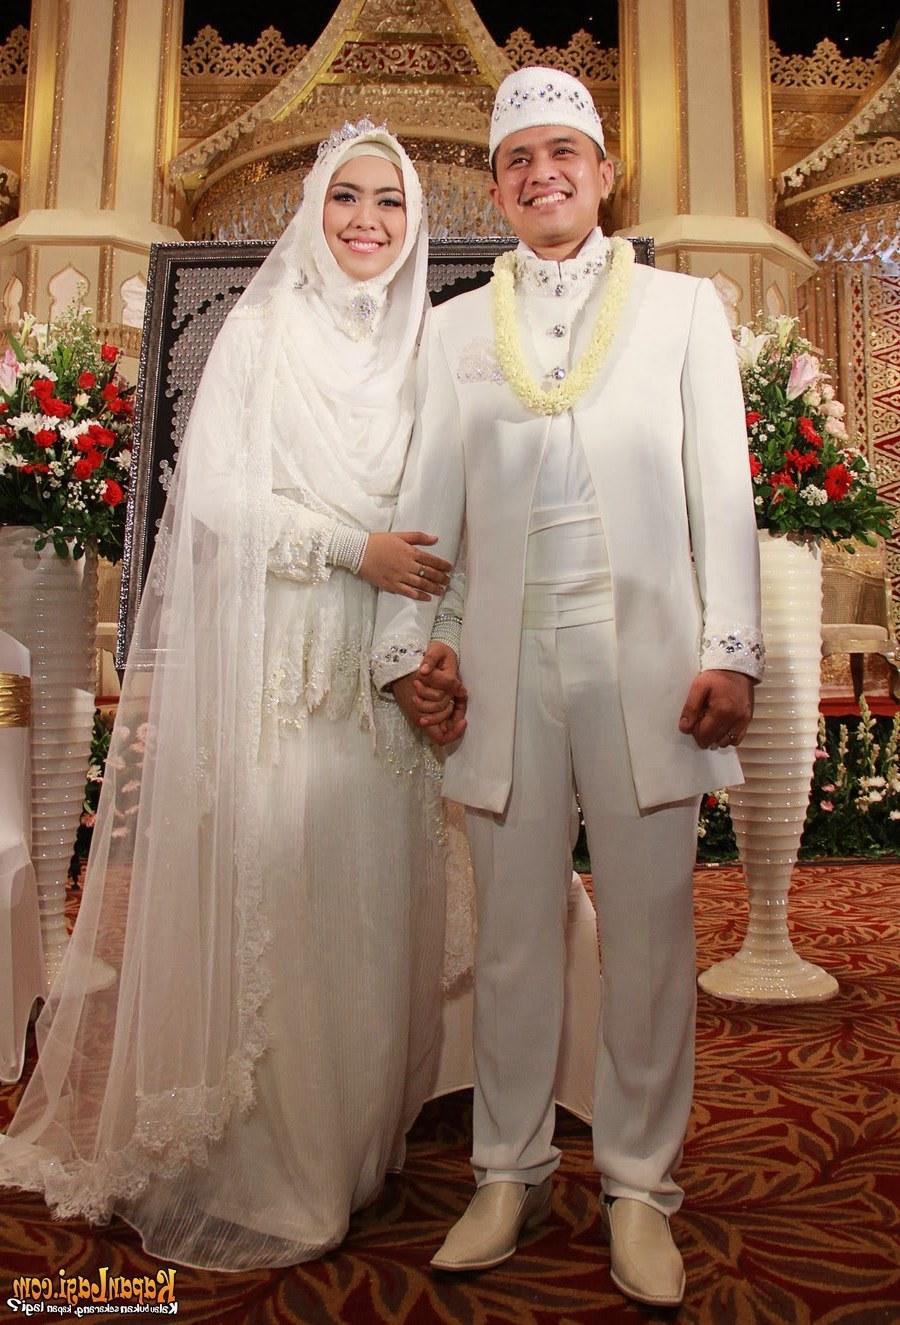 Ide Baju Pengantin Muslimah Jawa Syar'i Wddj Kebaya Modern Muslim Marriage International Kebaya Batik